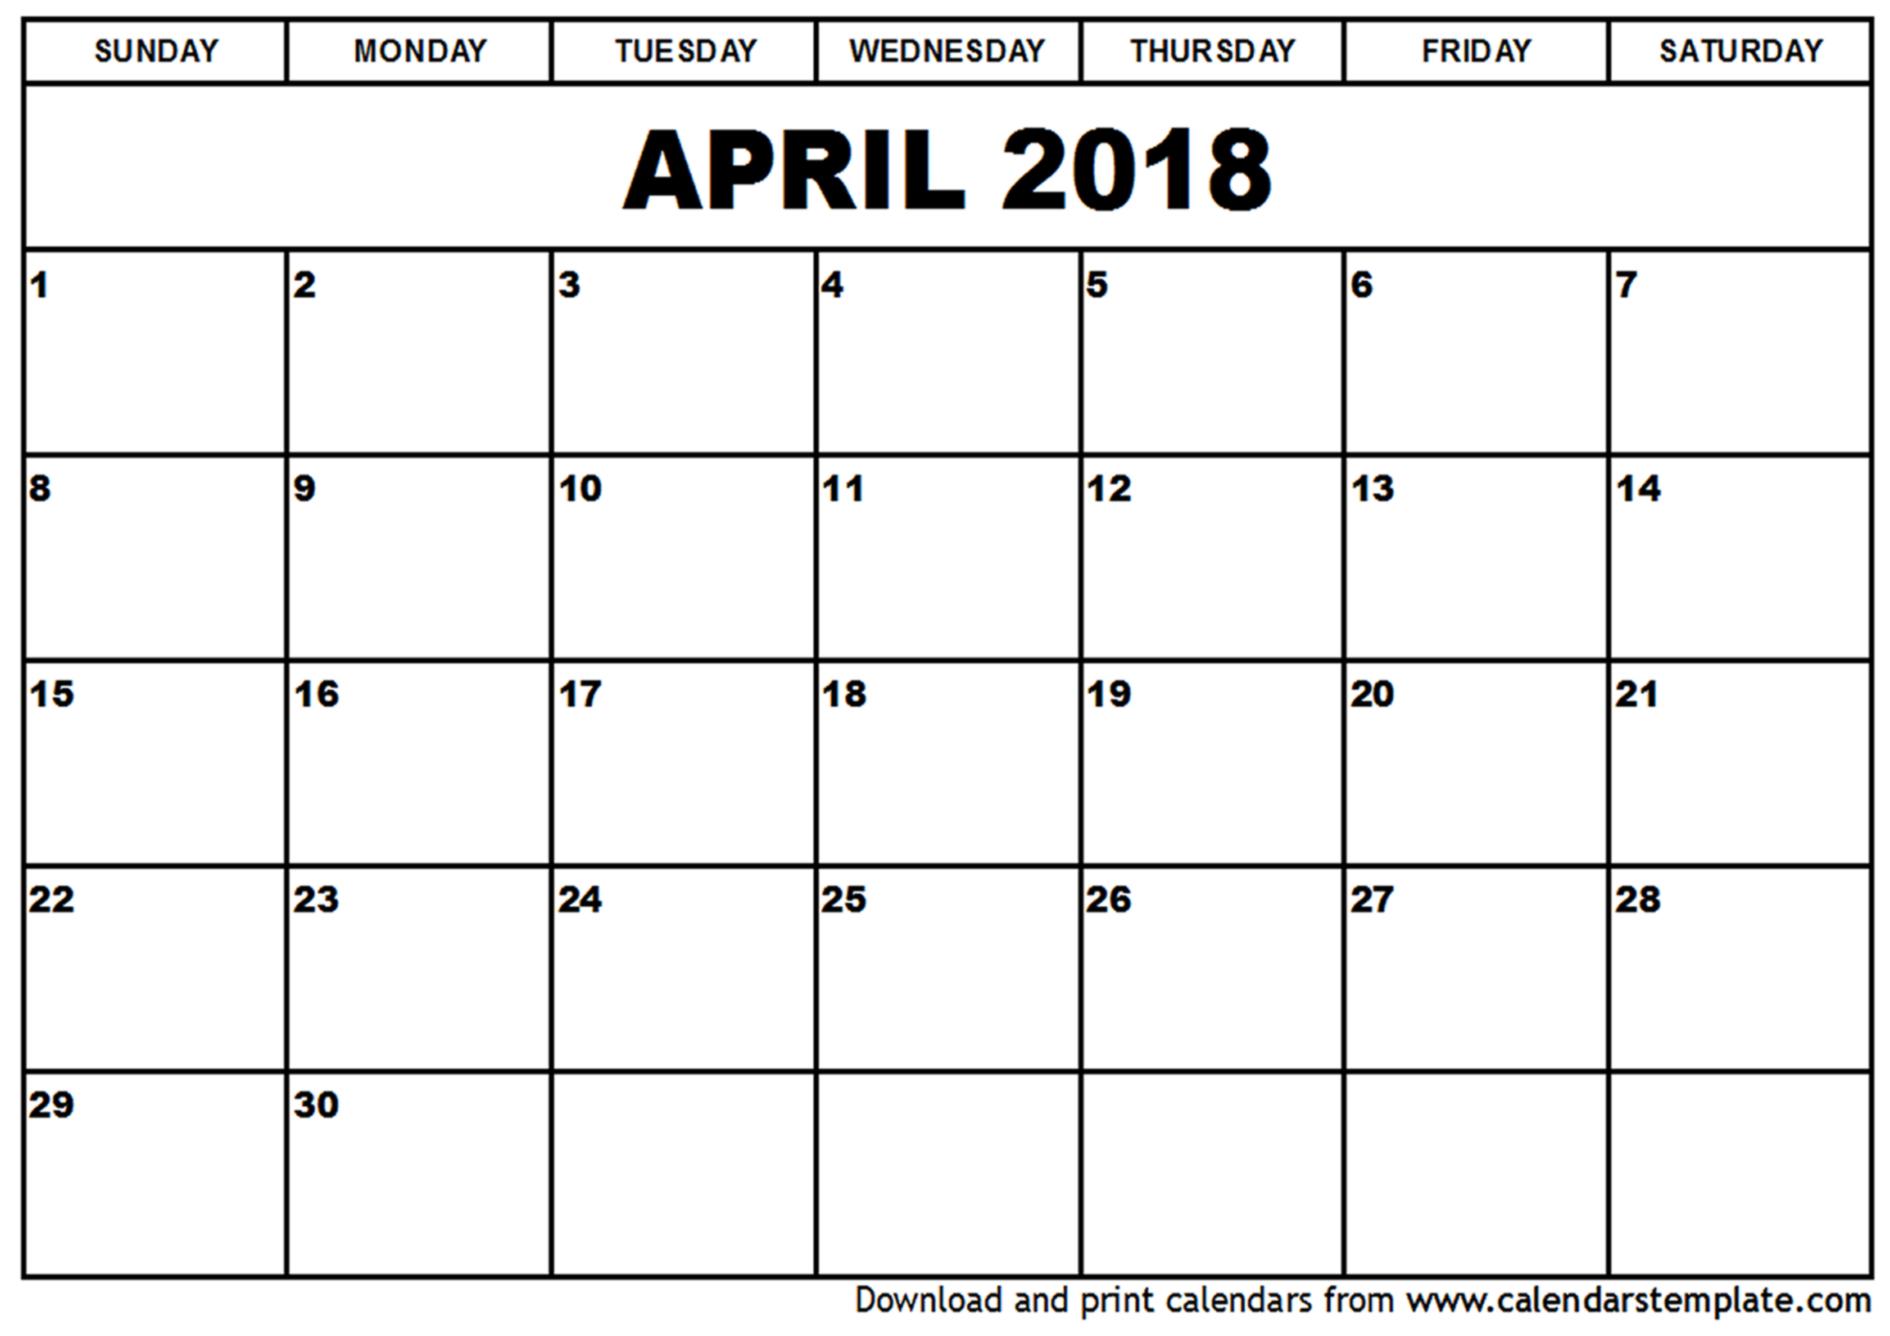 Print April 18 Calendar